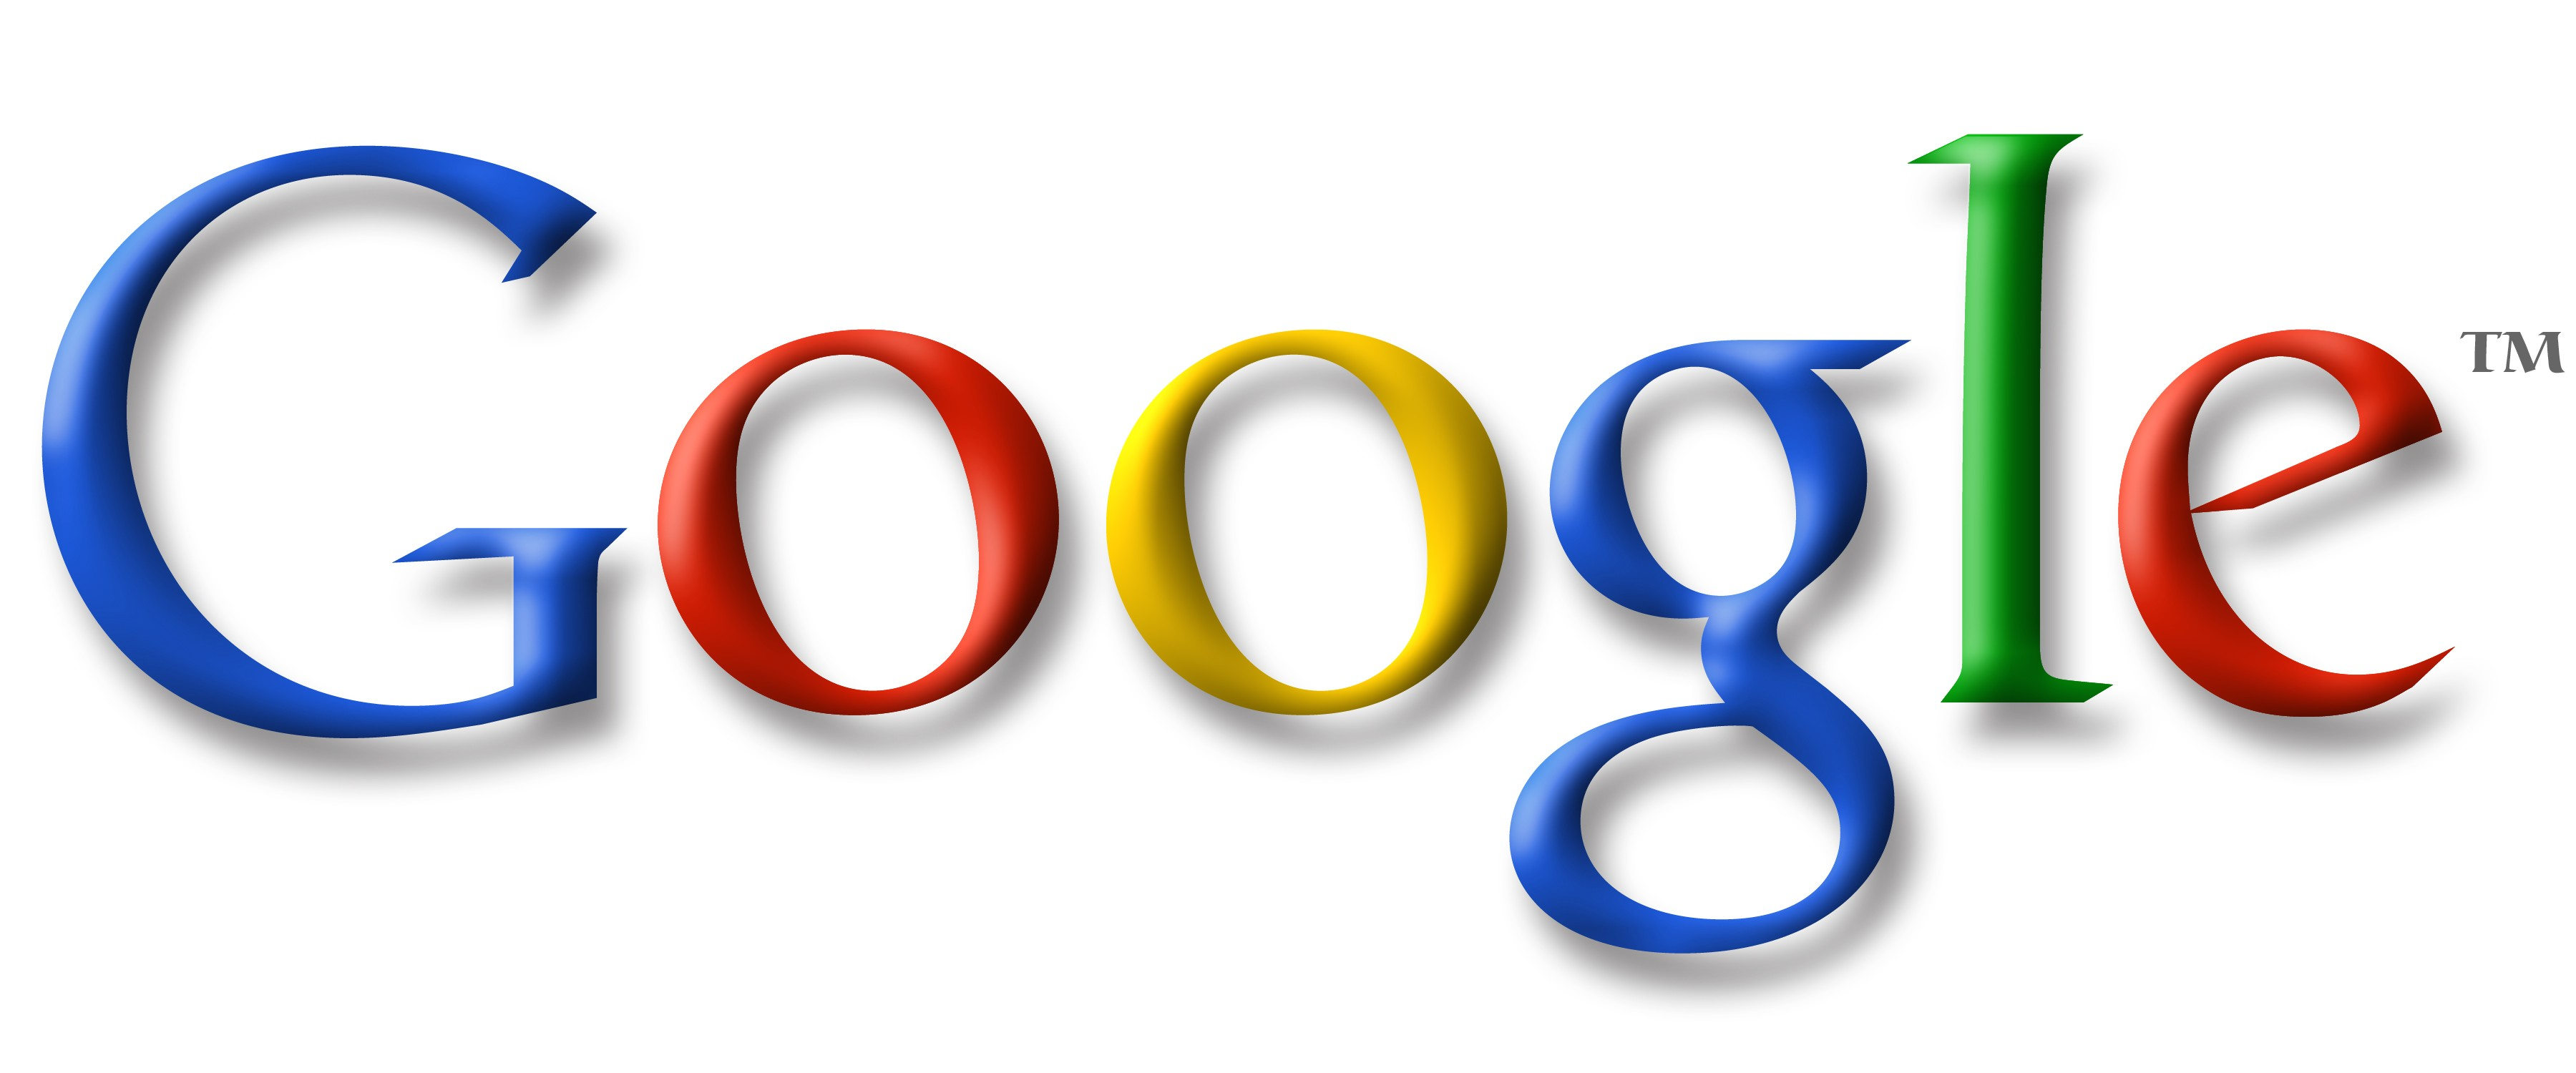 Google website logo